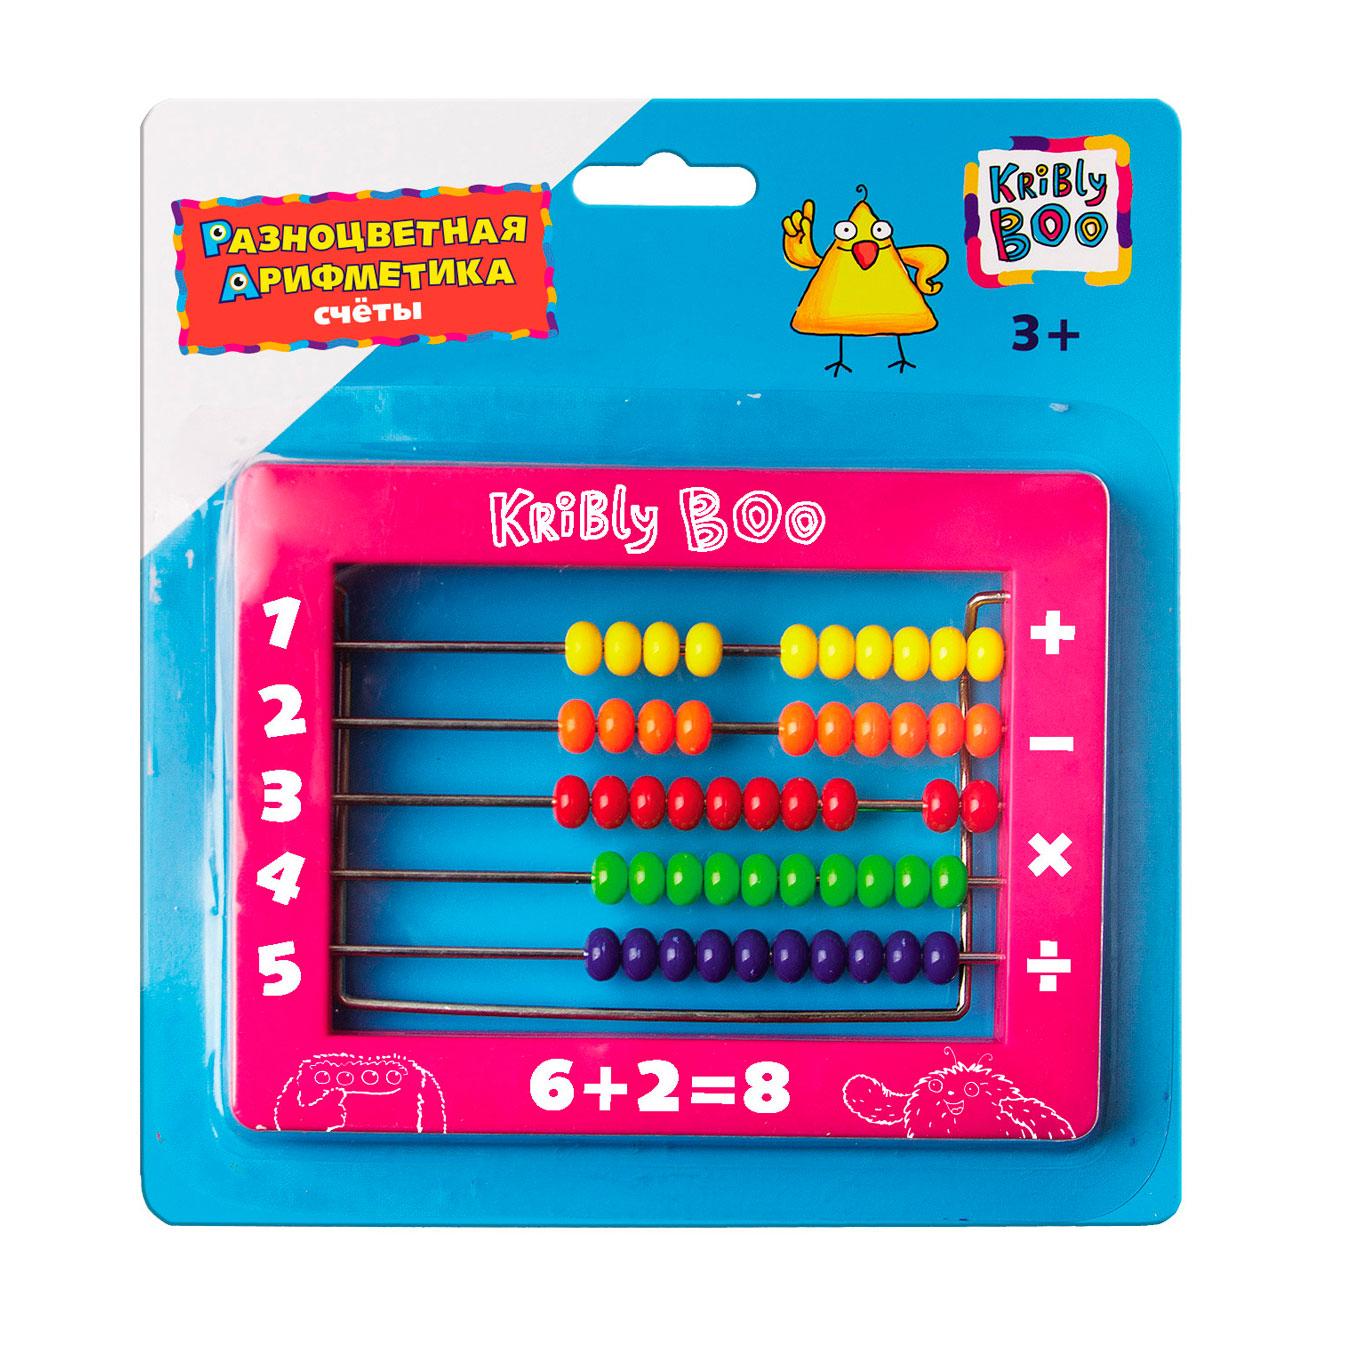 Счеты Kribly Boo Разноцветная арифметика